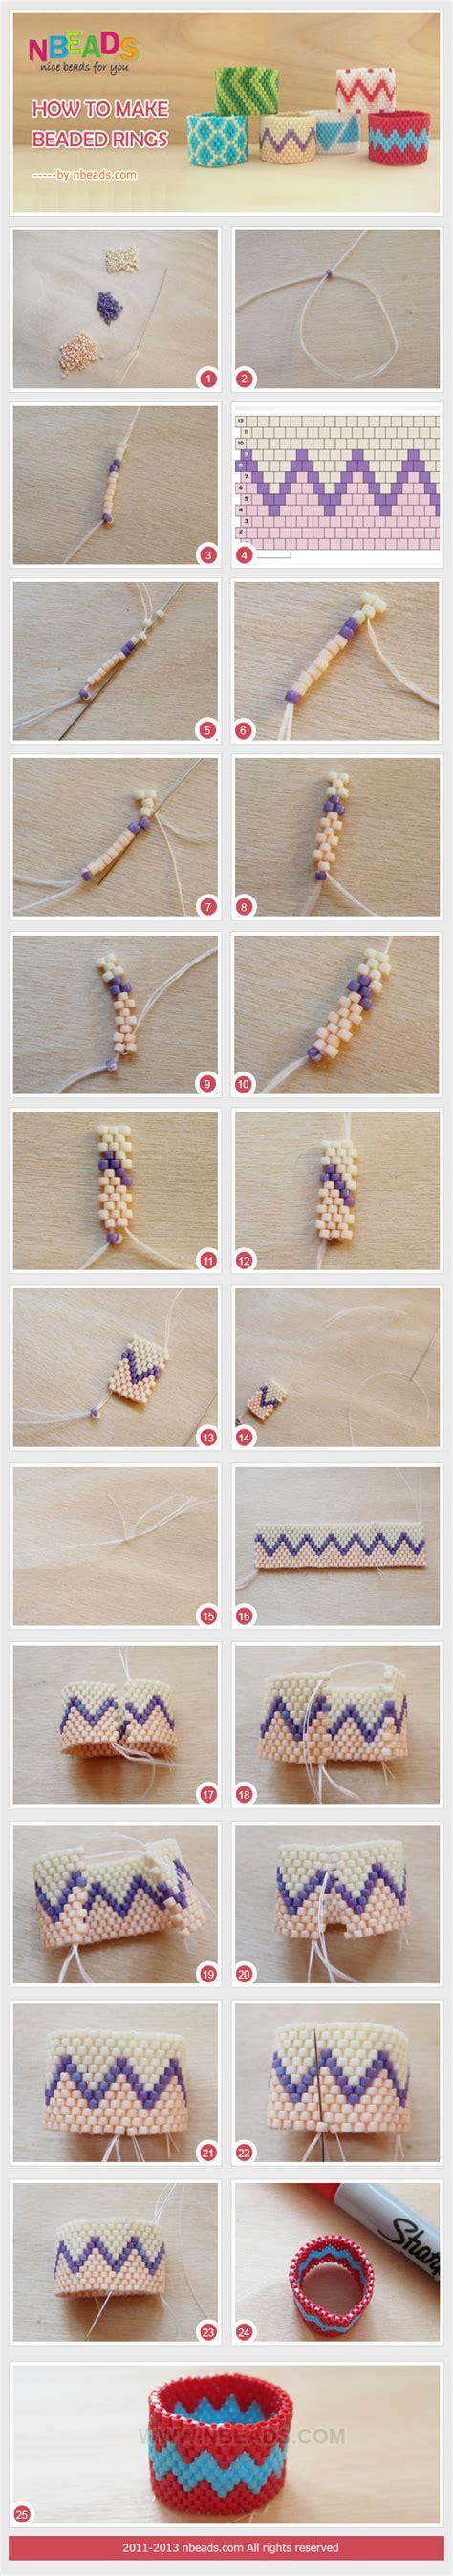 How To Make Beaded Rings Nbeads